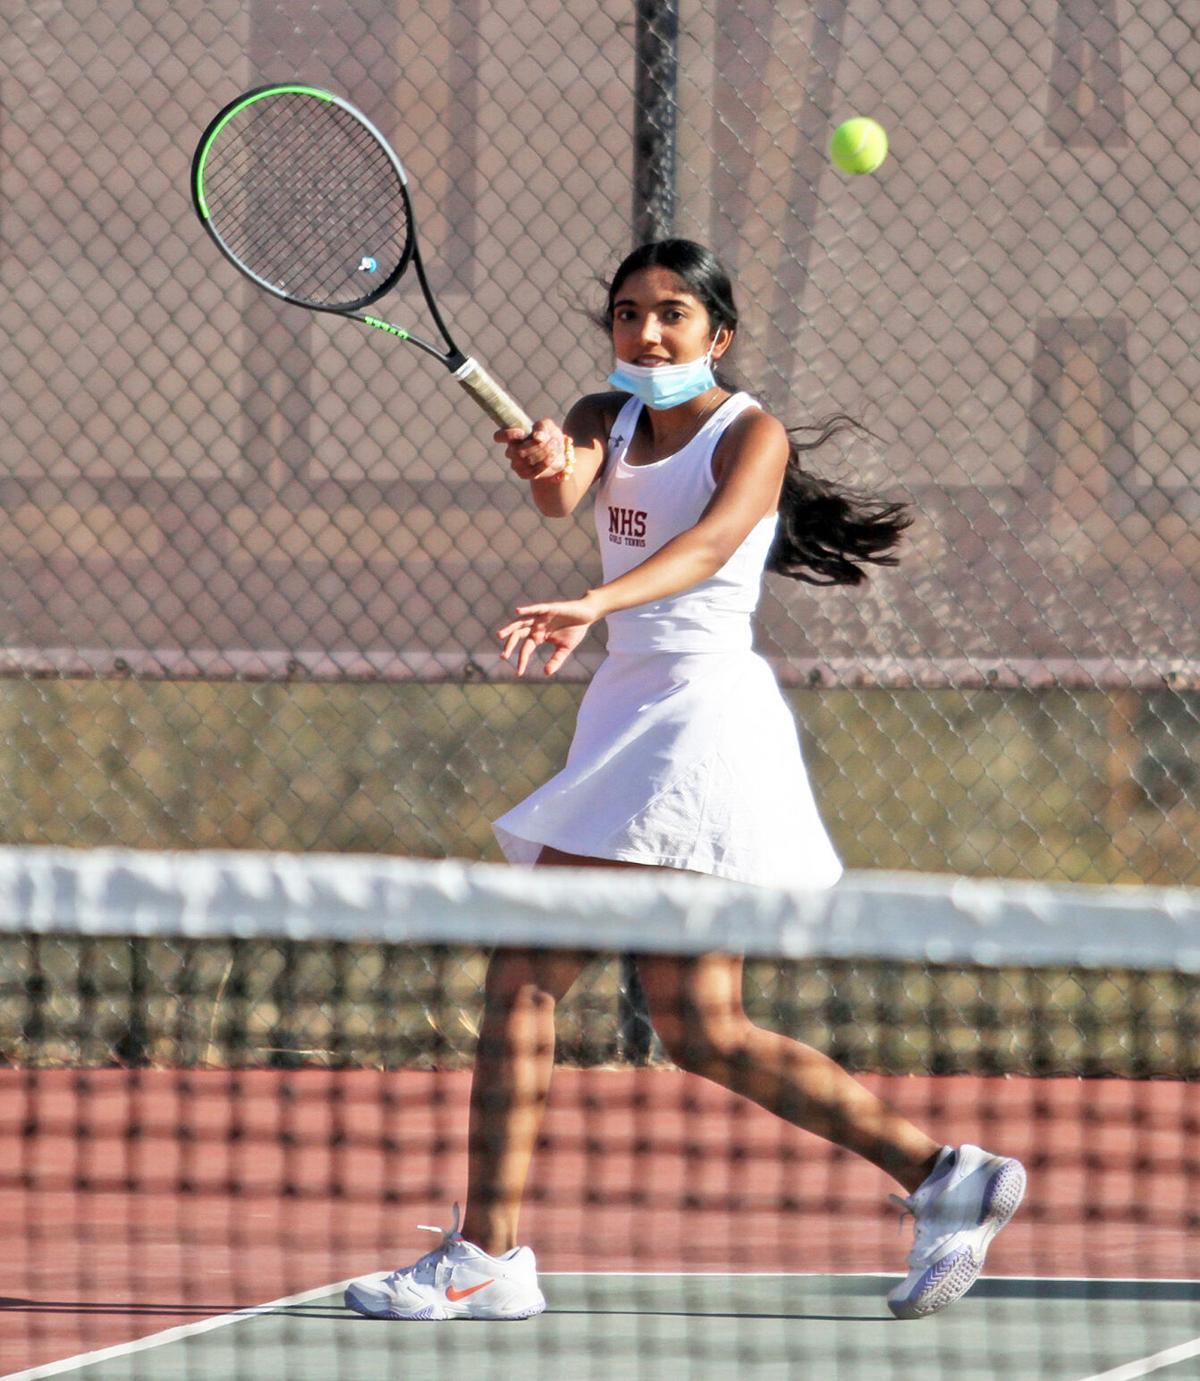 NHS girls tennis